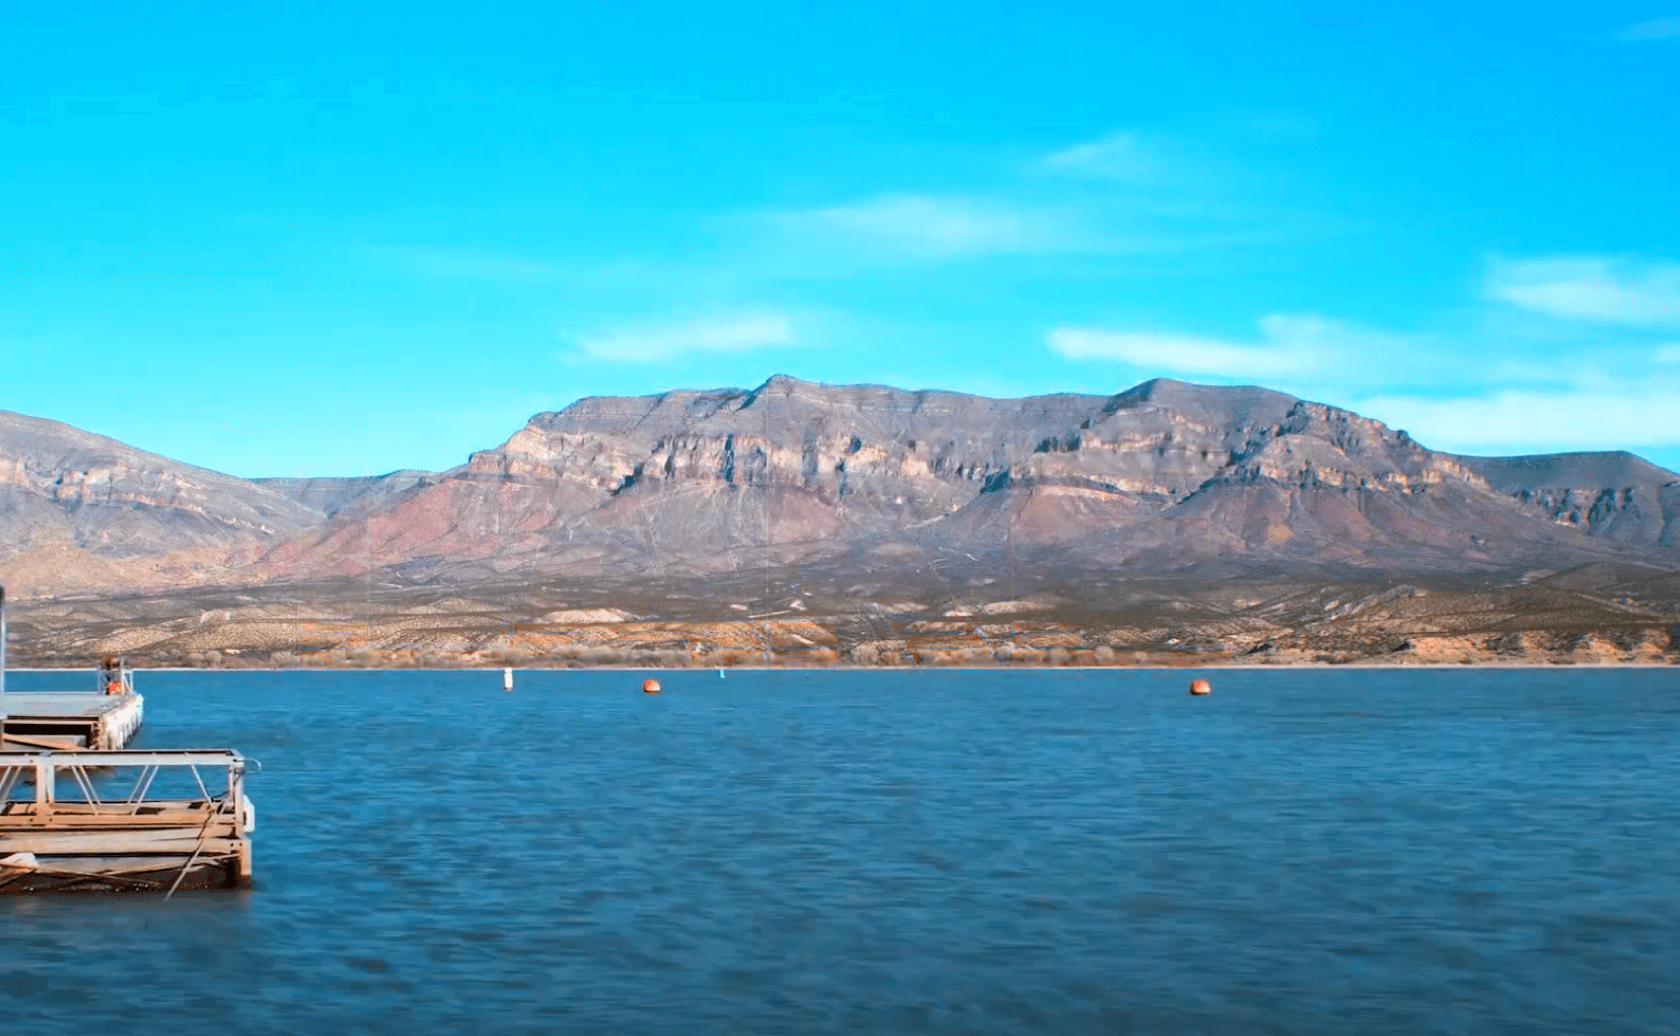 Caballo-Lake-Fishing-Guide-07-1